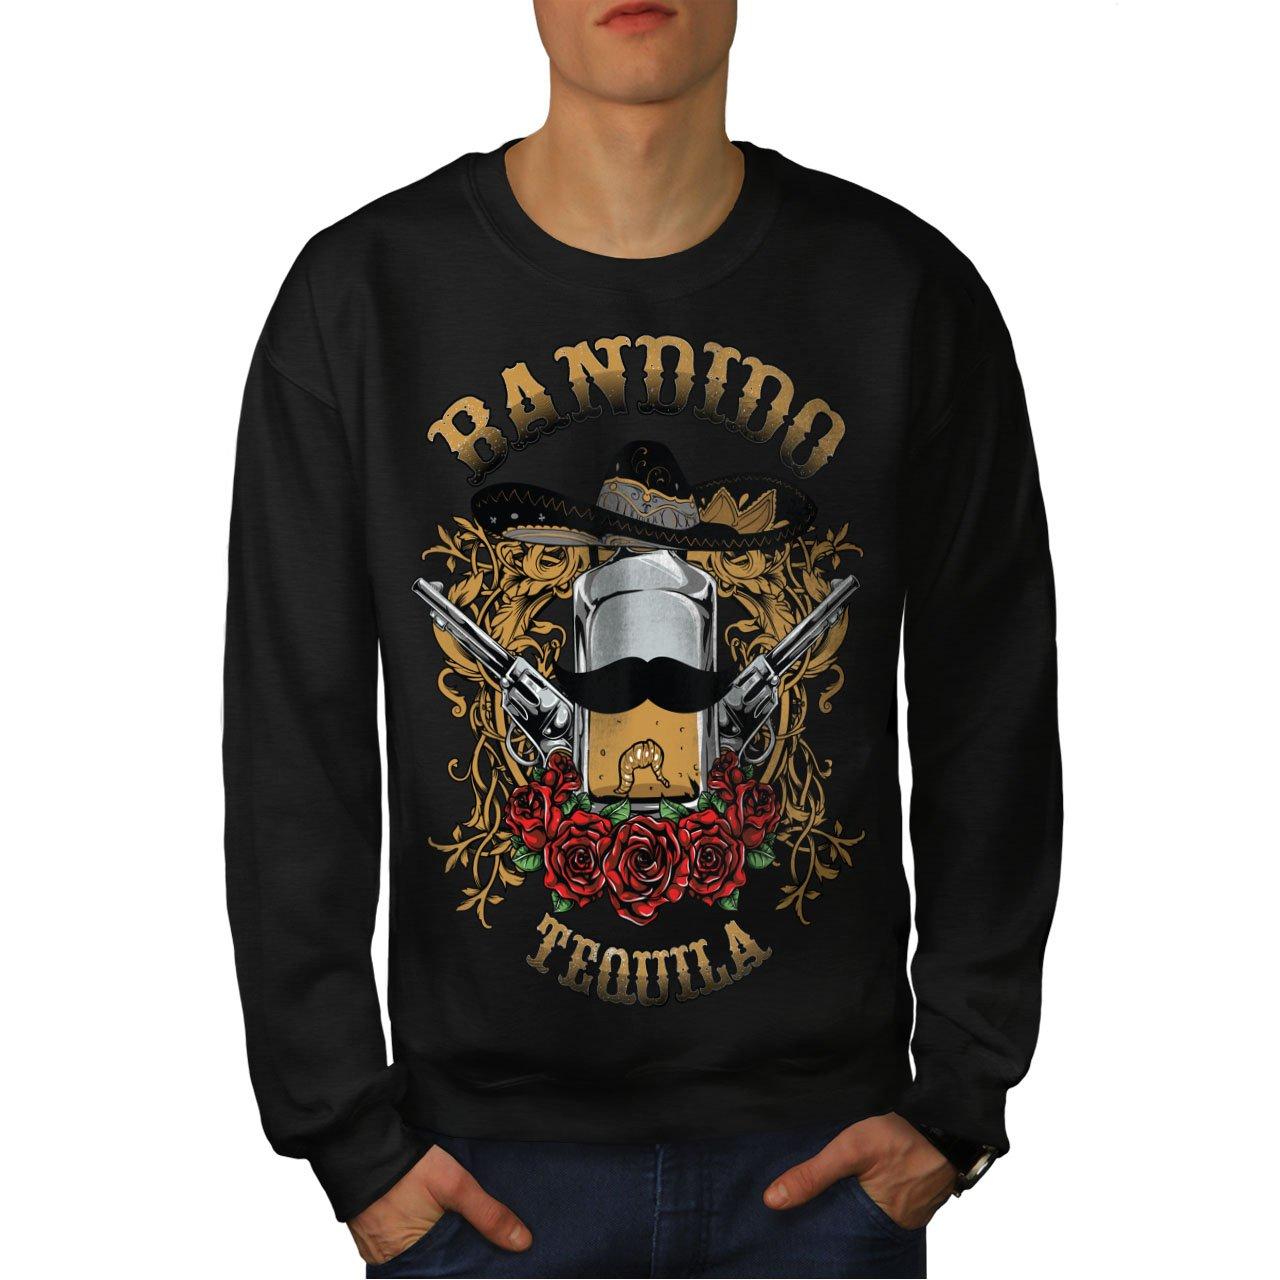 Mexico Casual Jumper wellcoda Bandido Tequila Rose Mens Sweatshirt